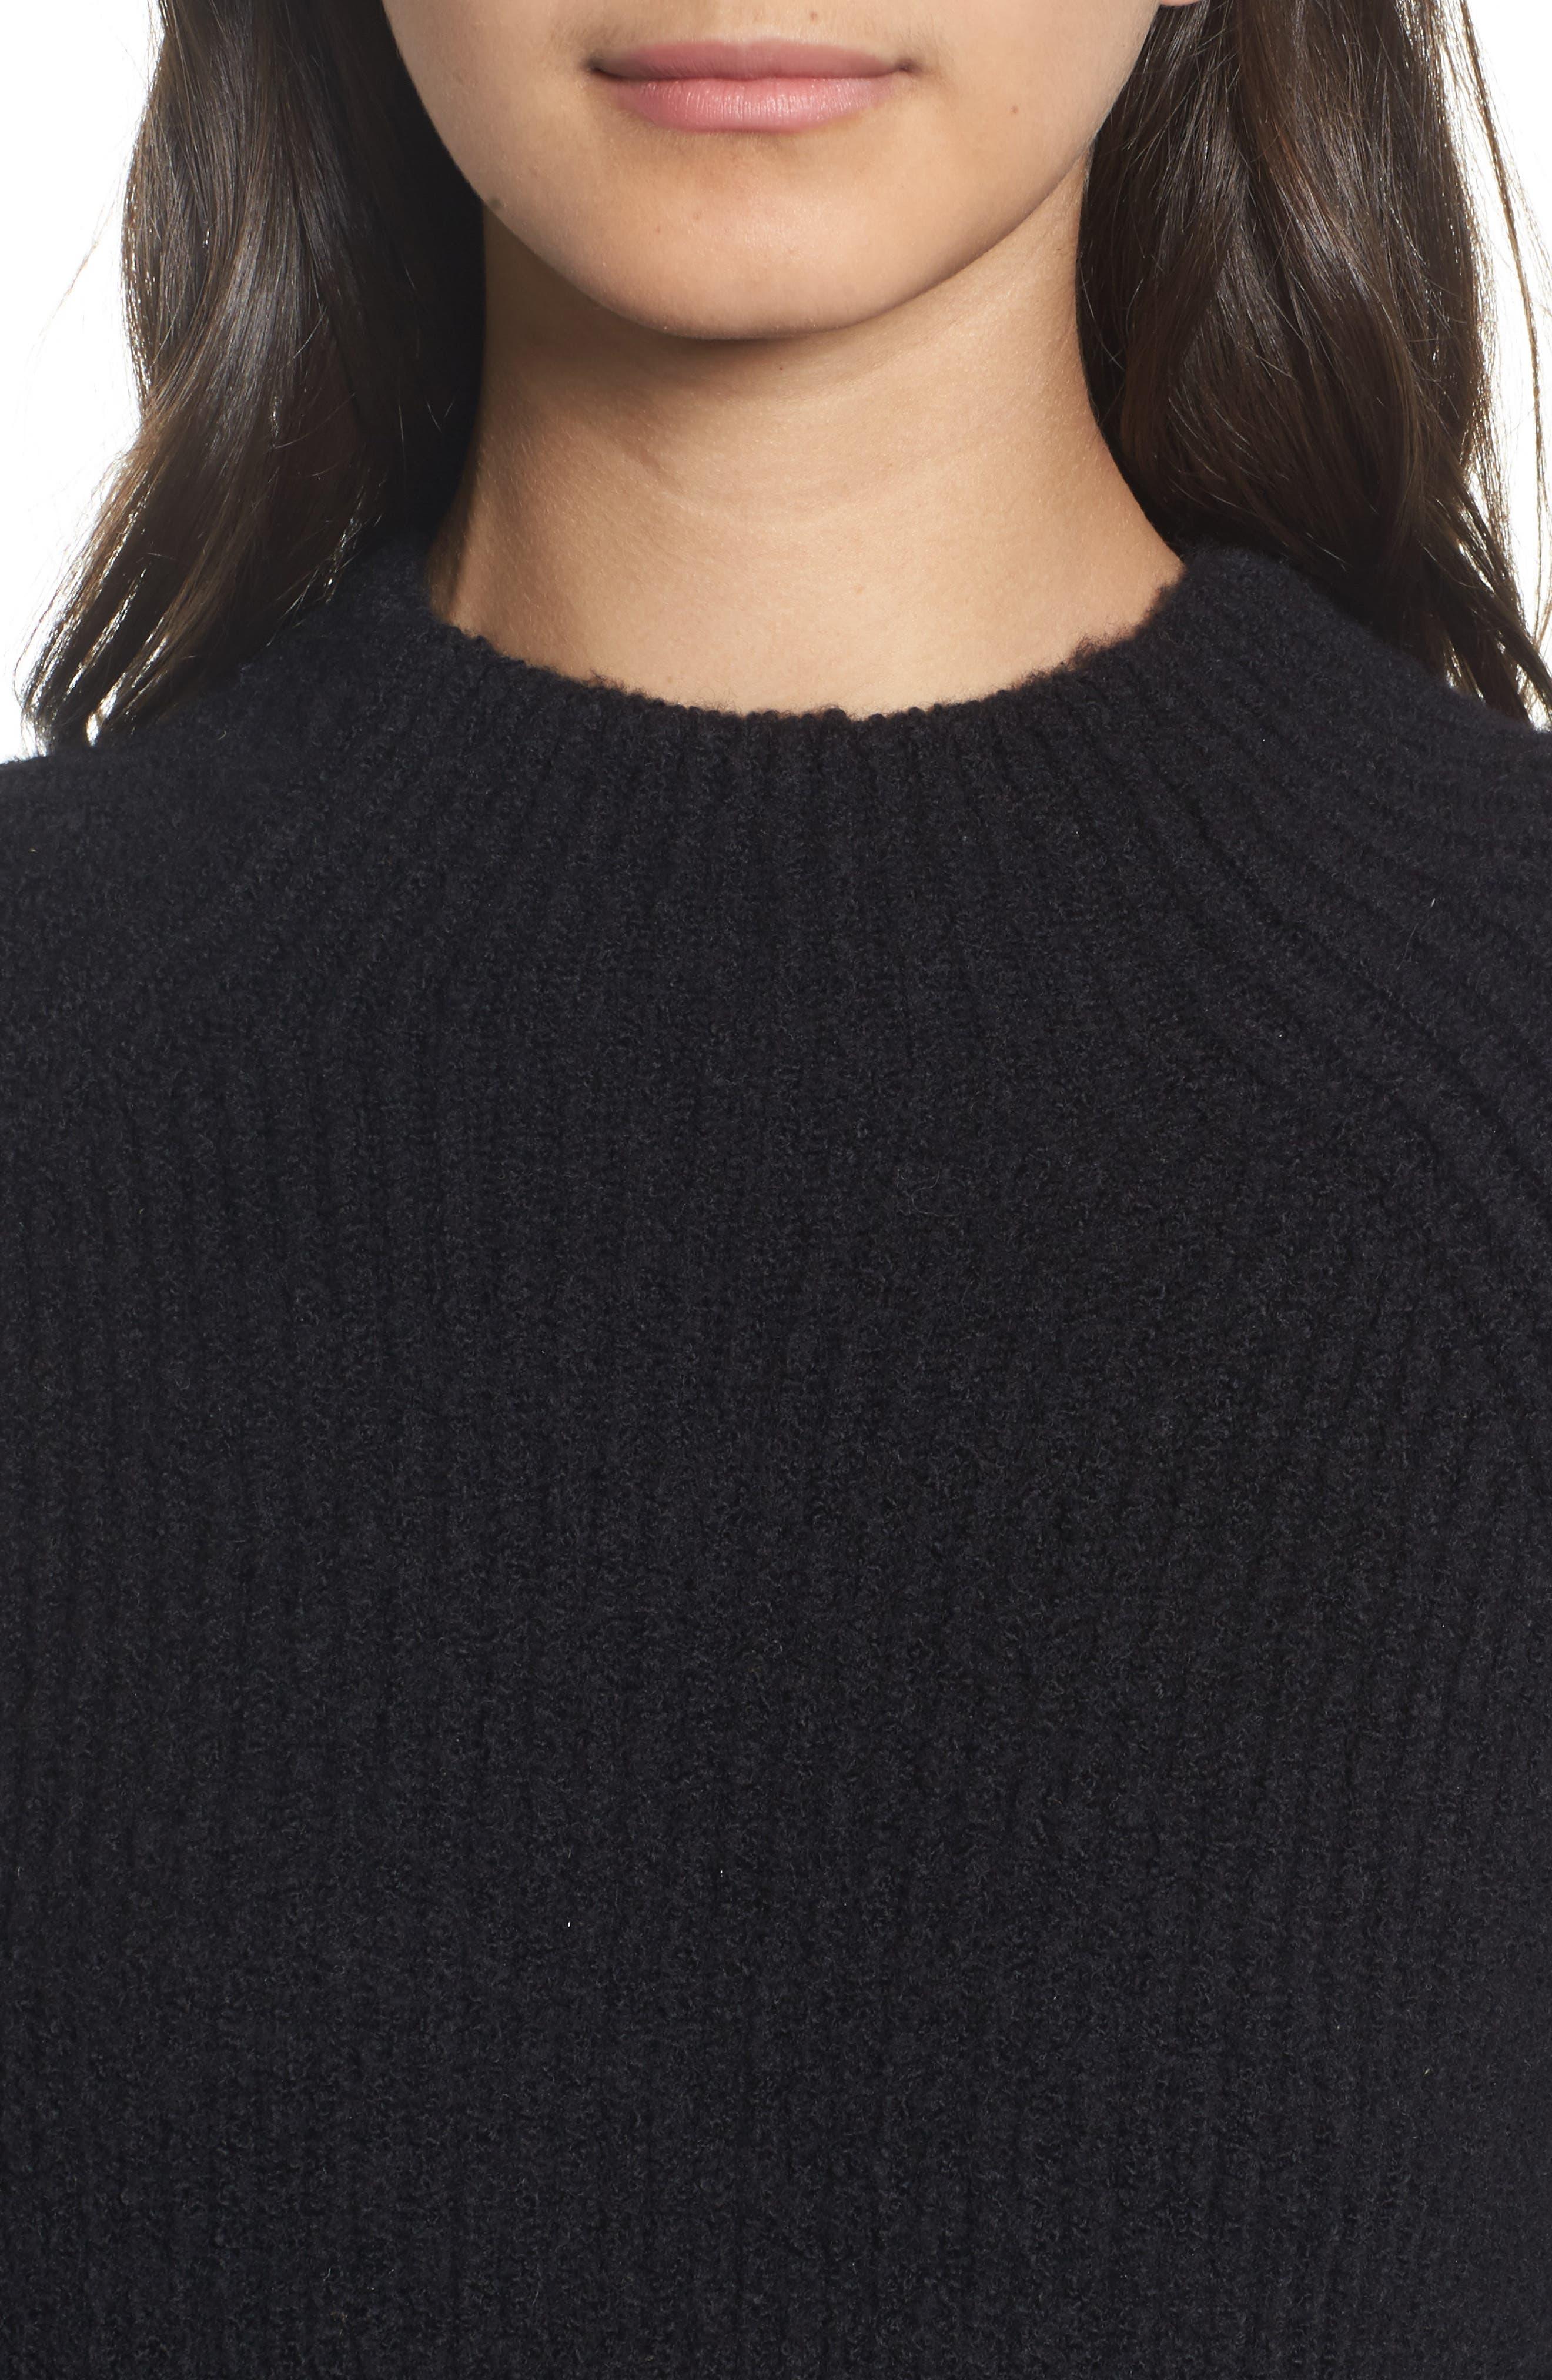 Northfield Mock Neck Sweater,                             Alternate thumbnail 4, color,                             001